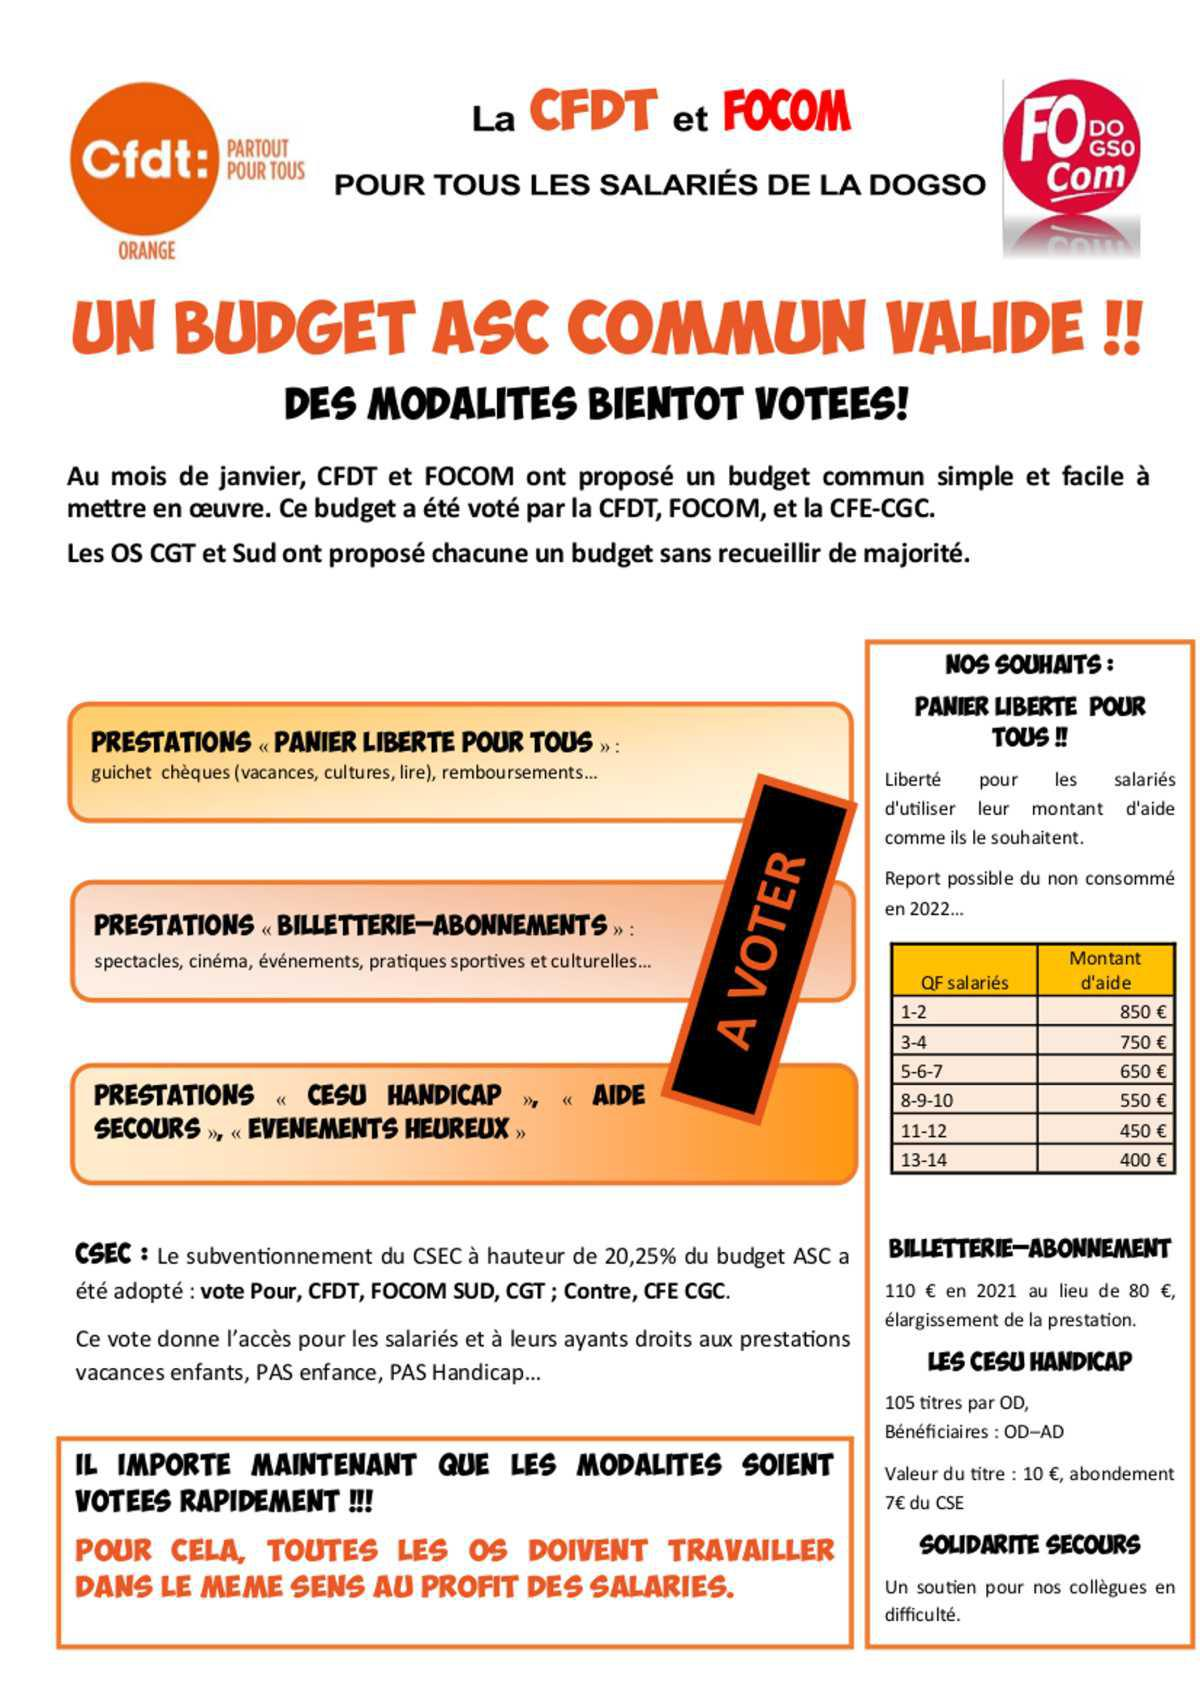 Budget ASC 2021 validé